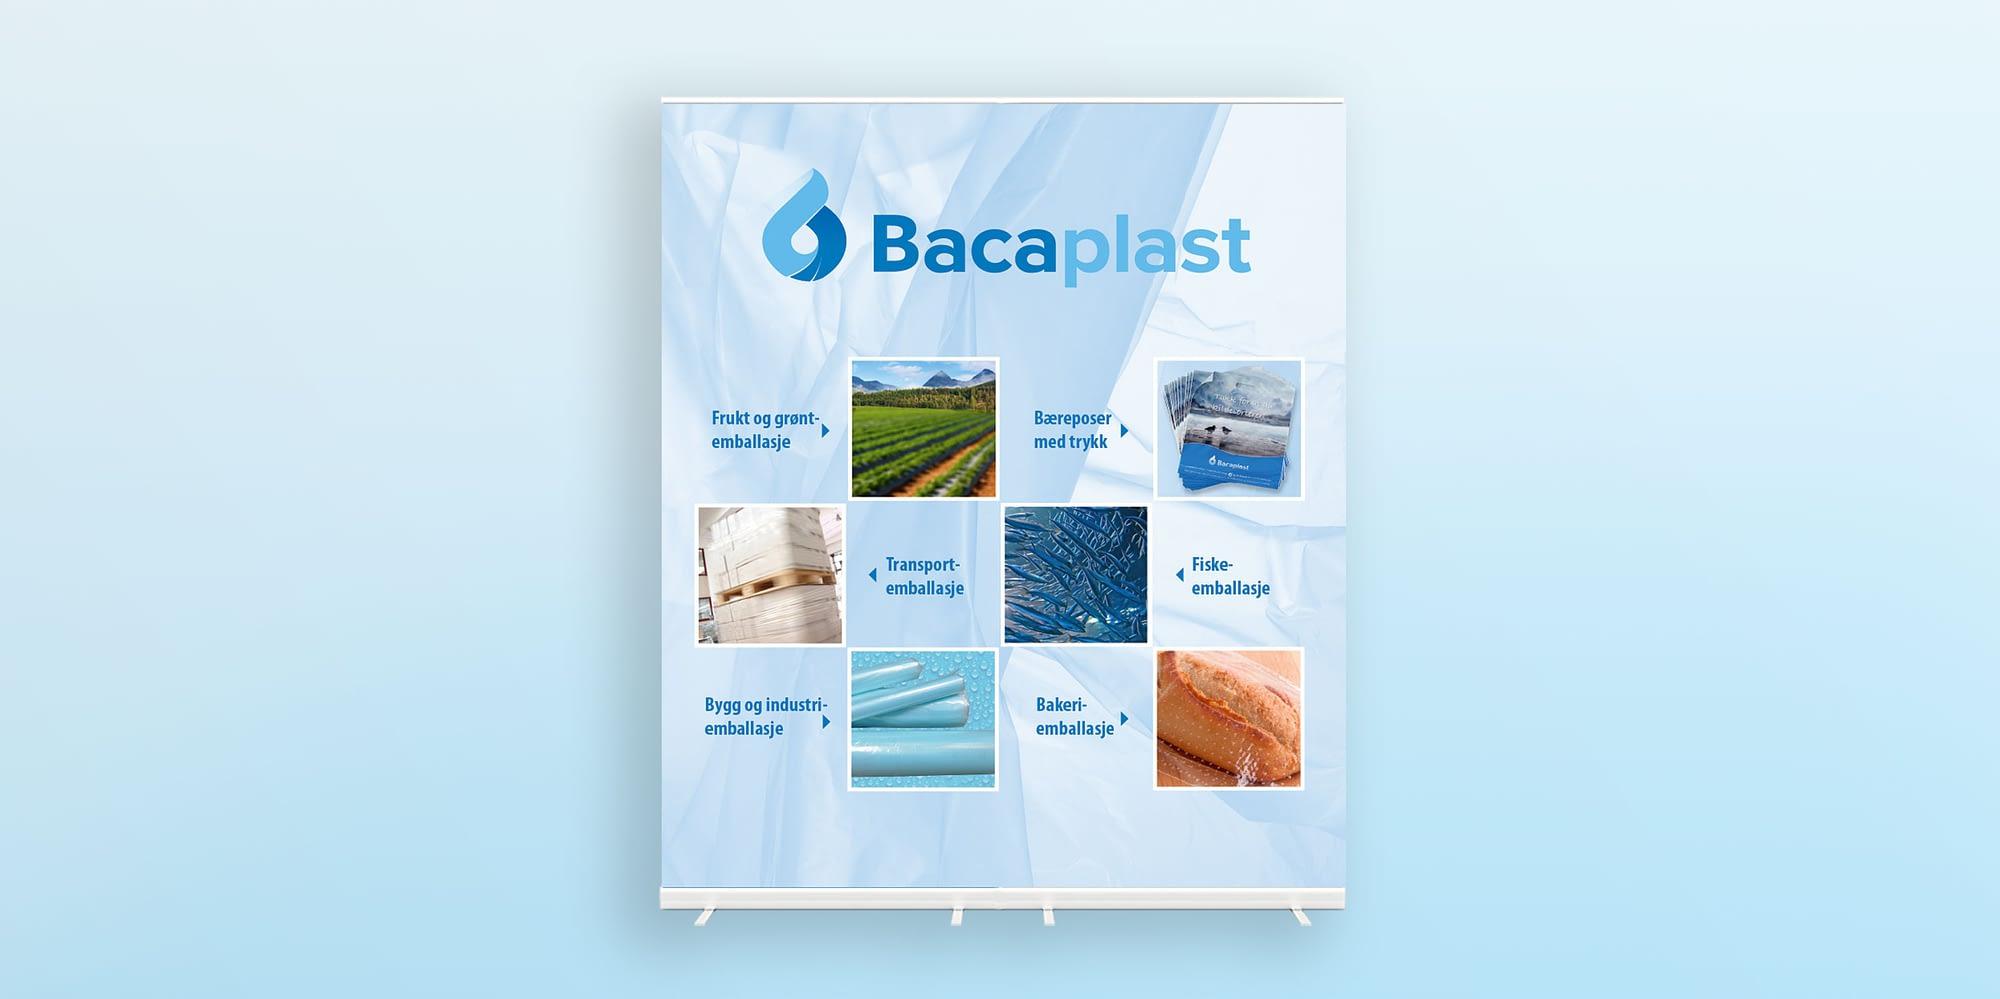 Baca plast grafisk profil - designet av reklamebyrå på vestlandet